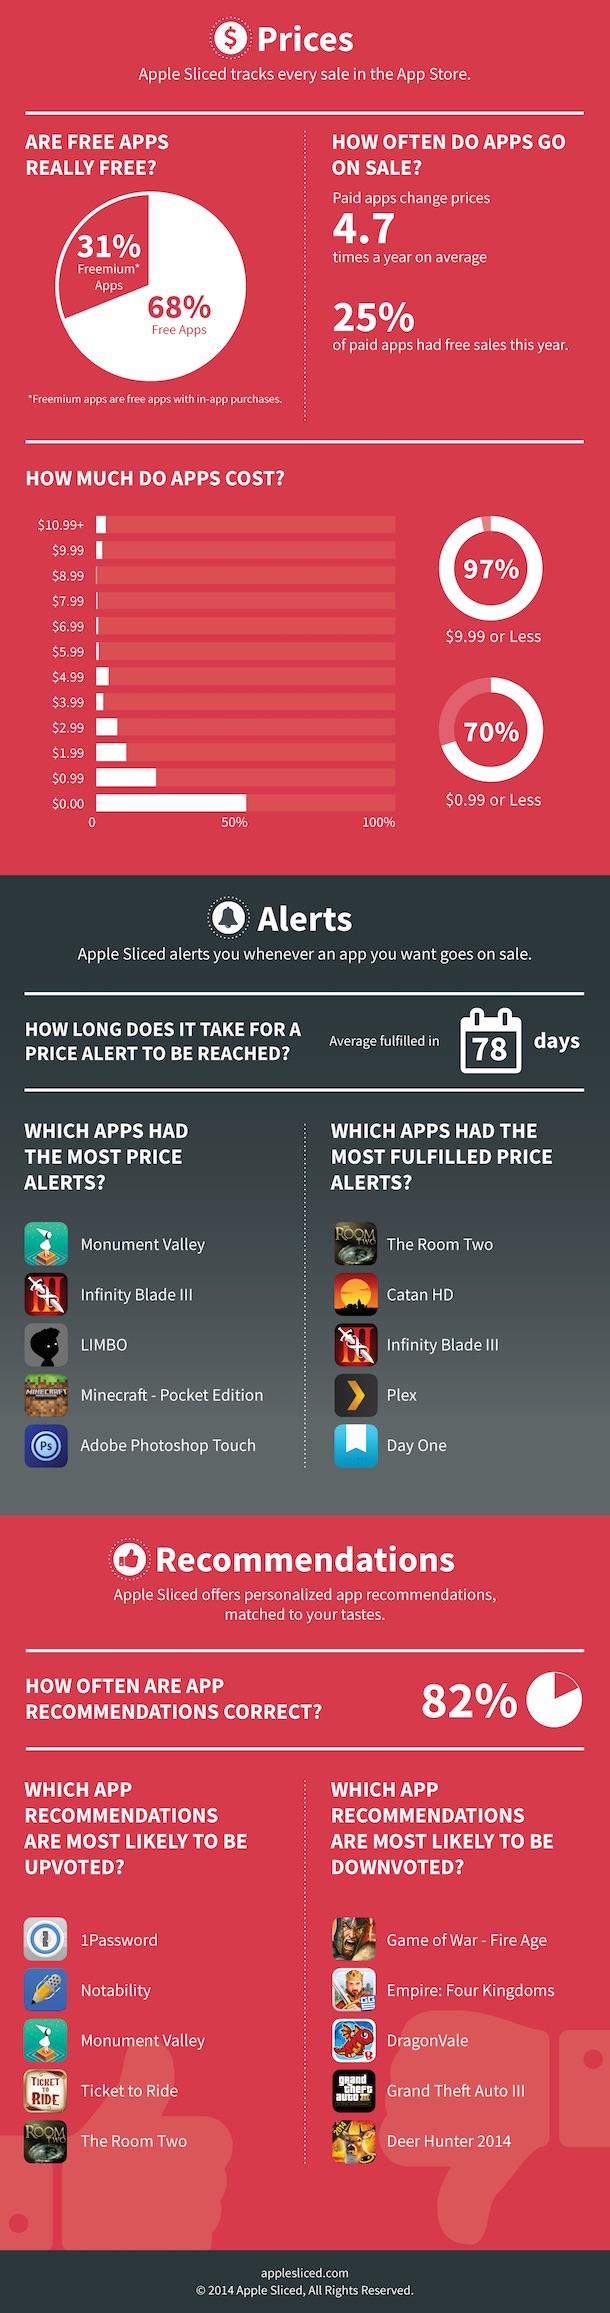 app_store_stats2014_2